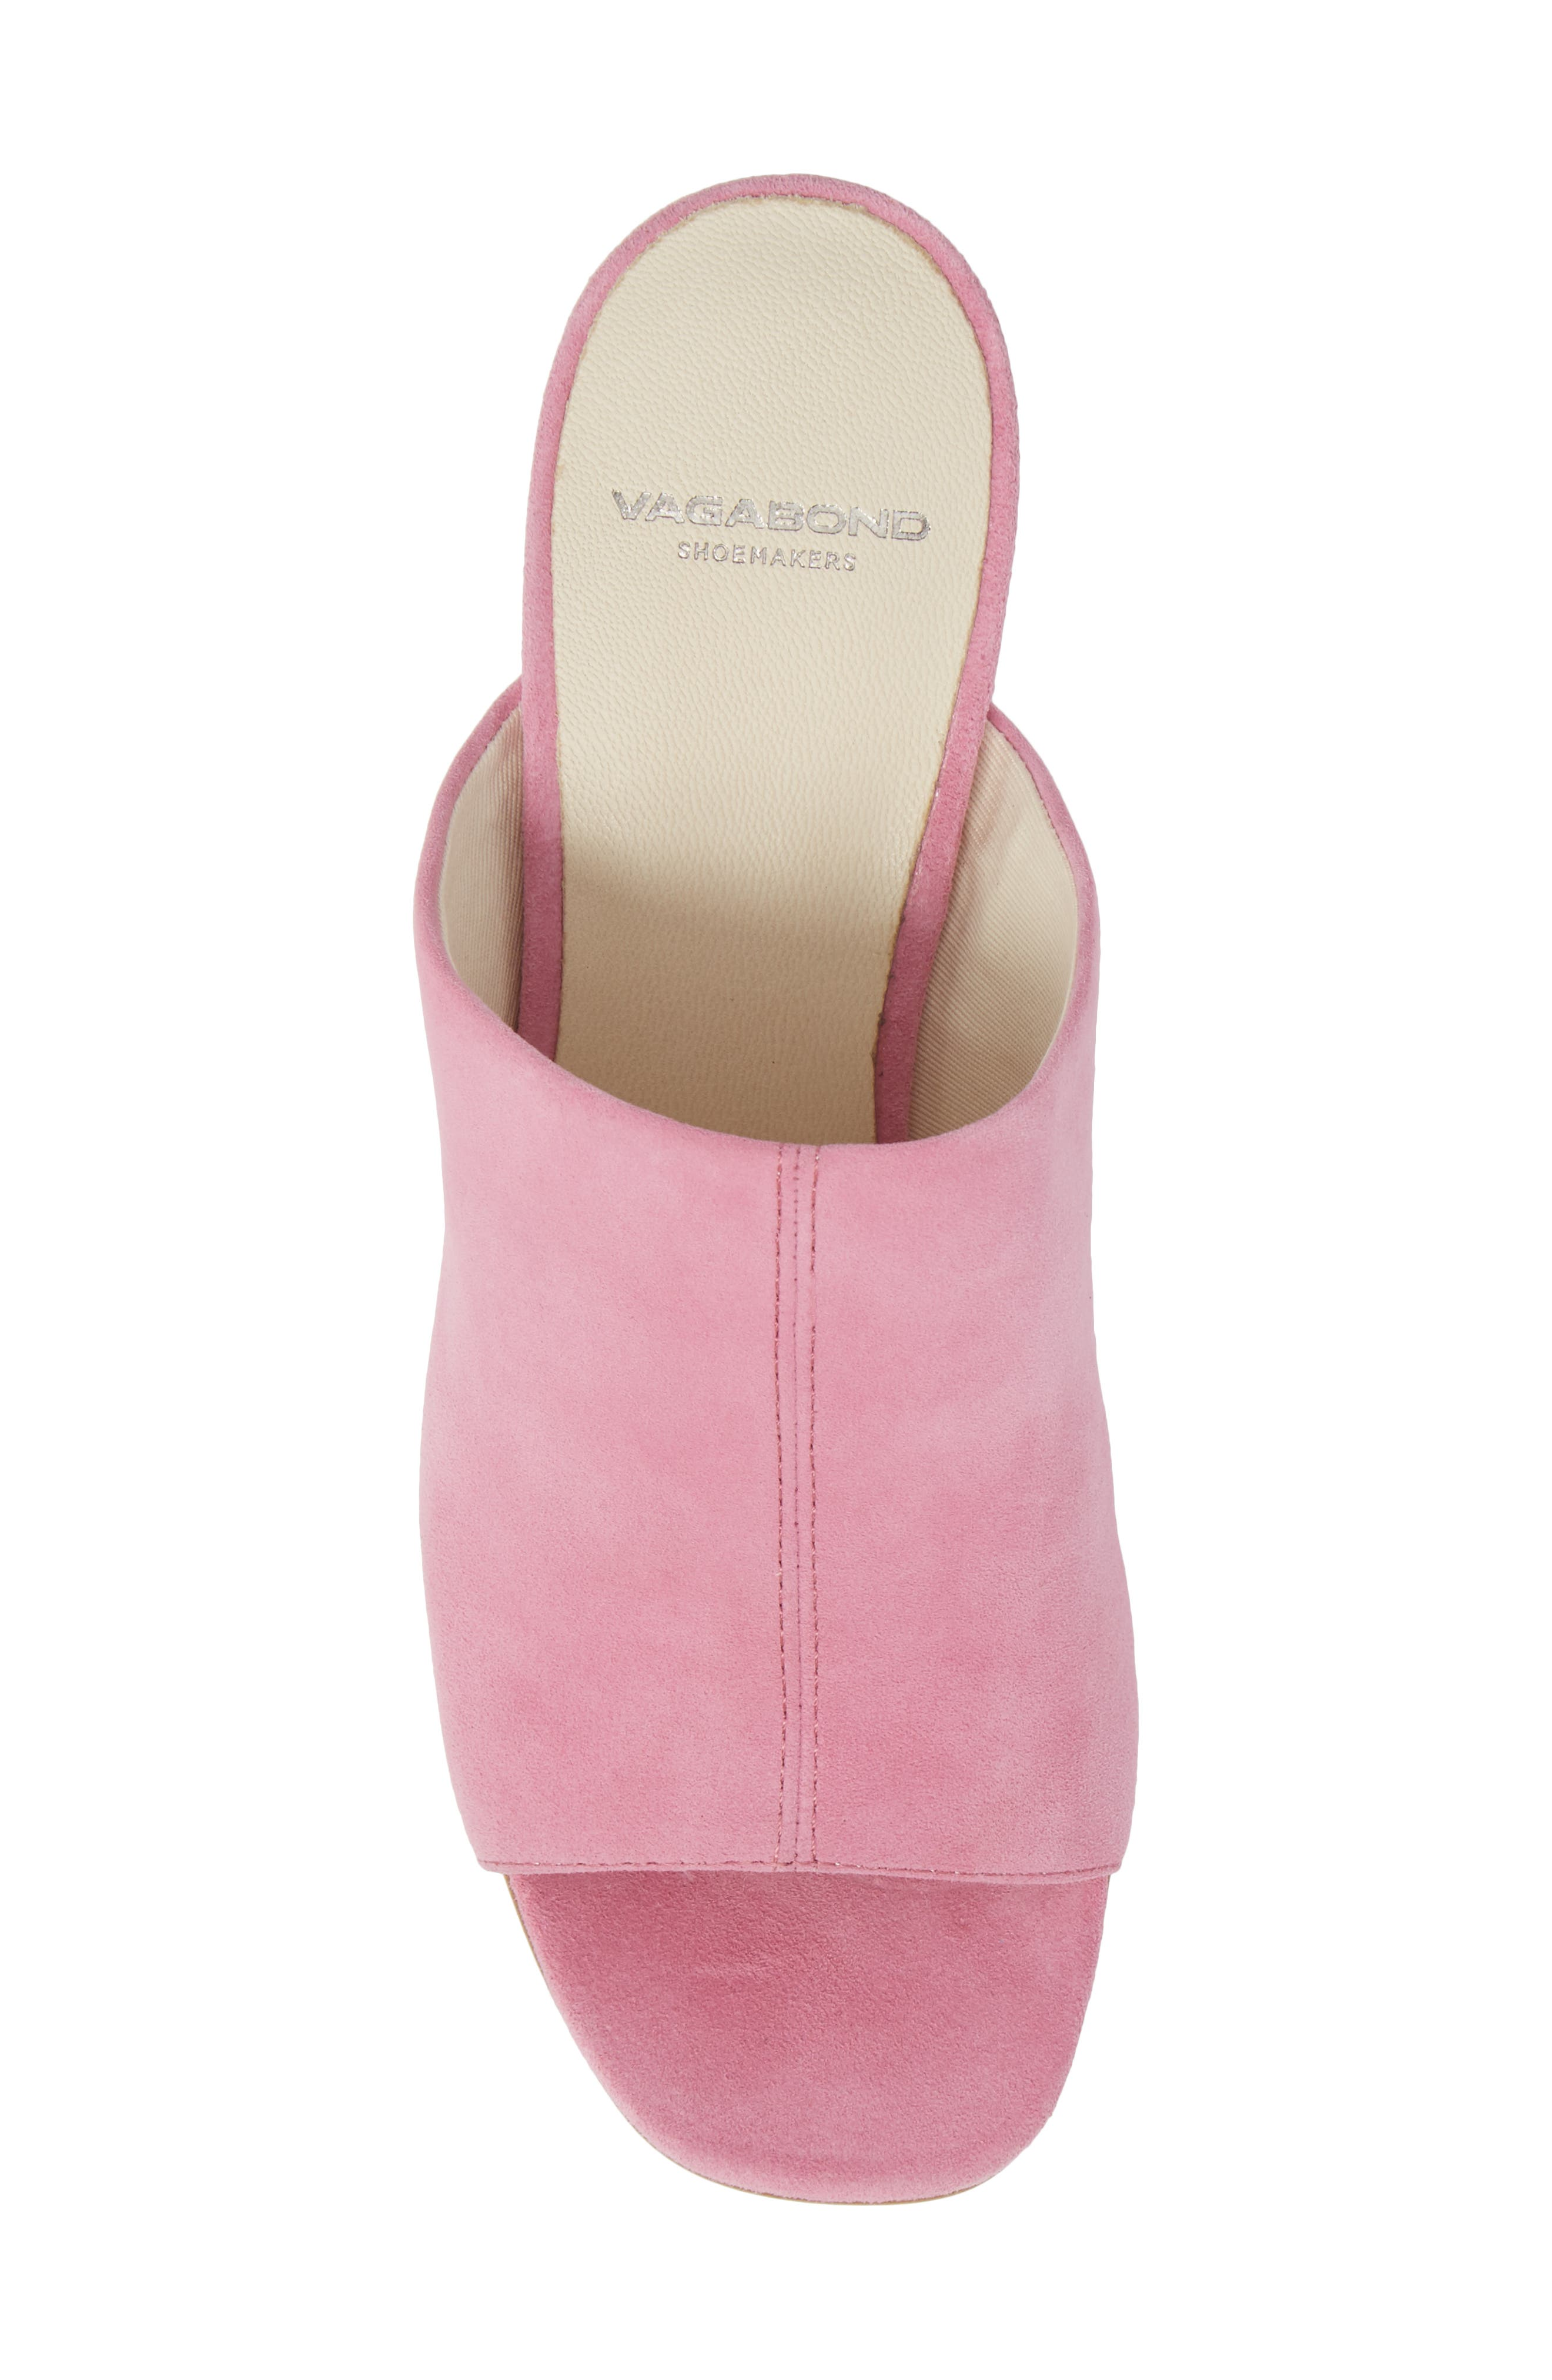 Saide Slide Sandal,                             Alternate thumbnail 5, color,                             Pink Suede